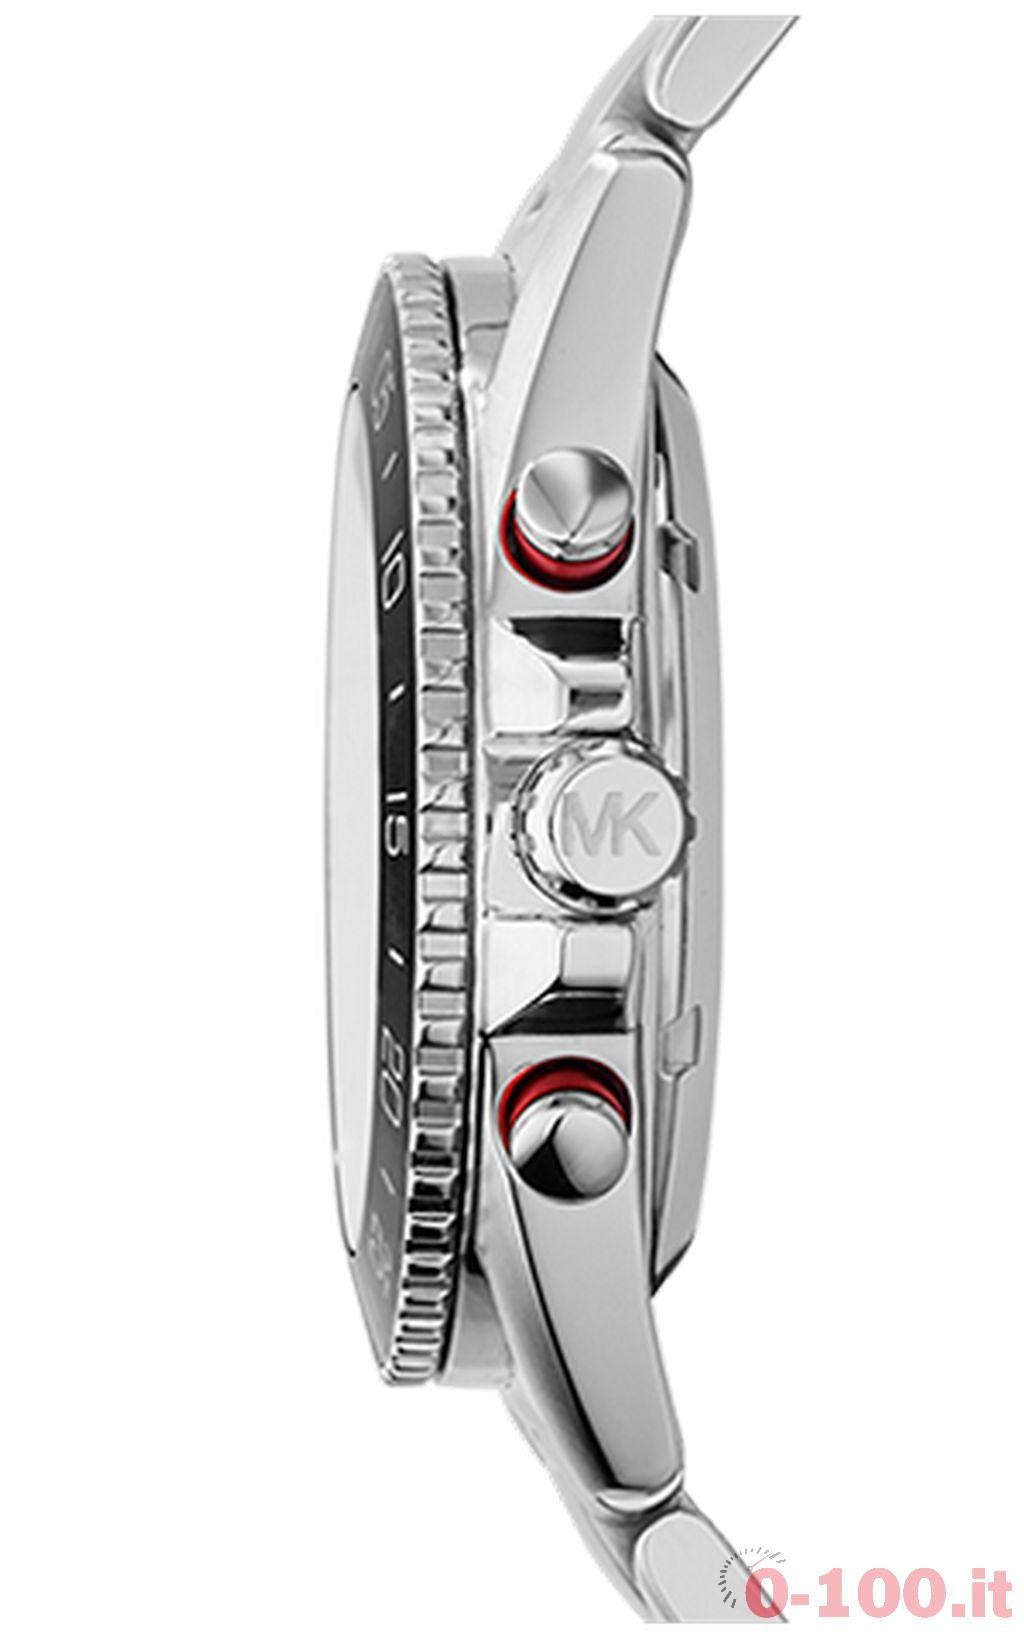 michael-kors-jetmaster-automatic-watch-prezzo-price-0-100_4